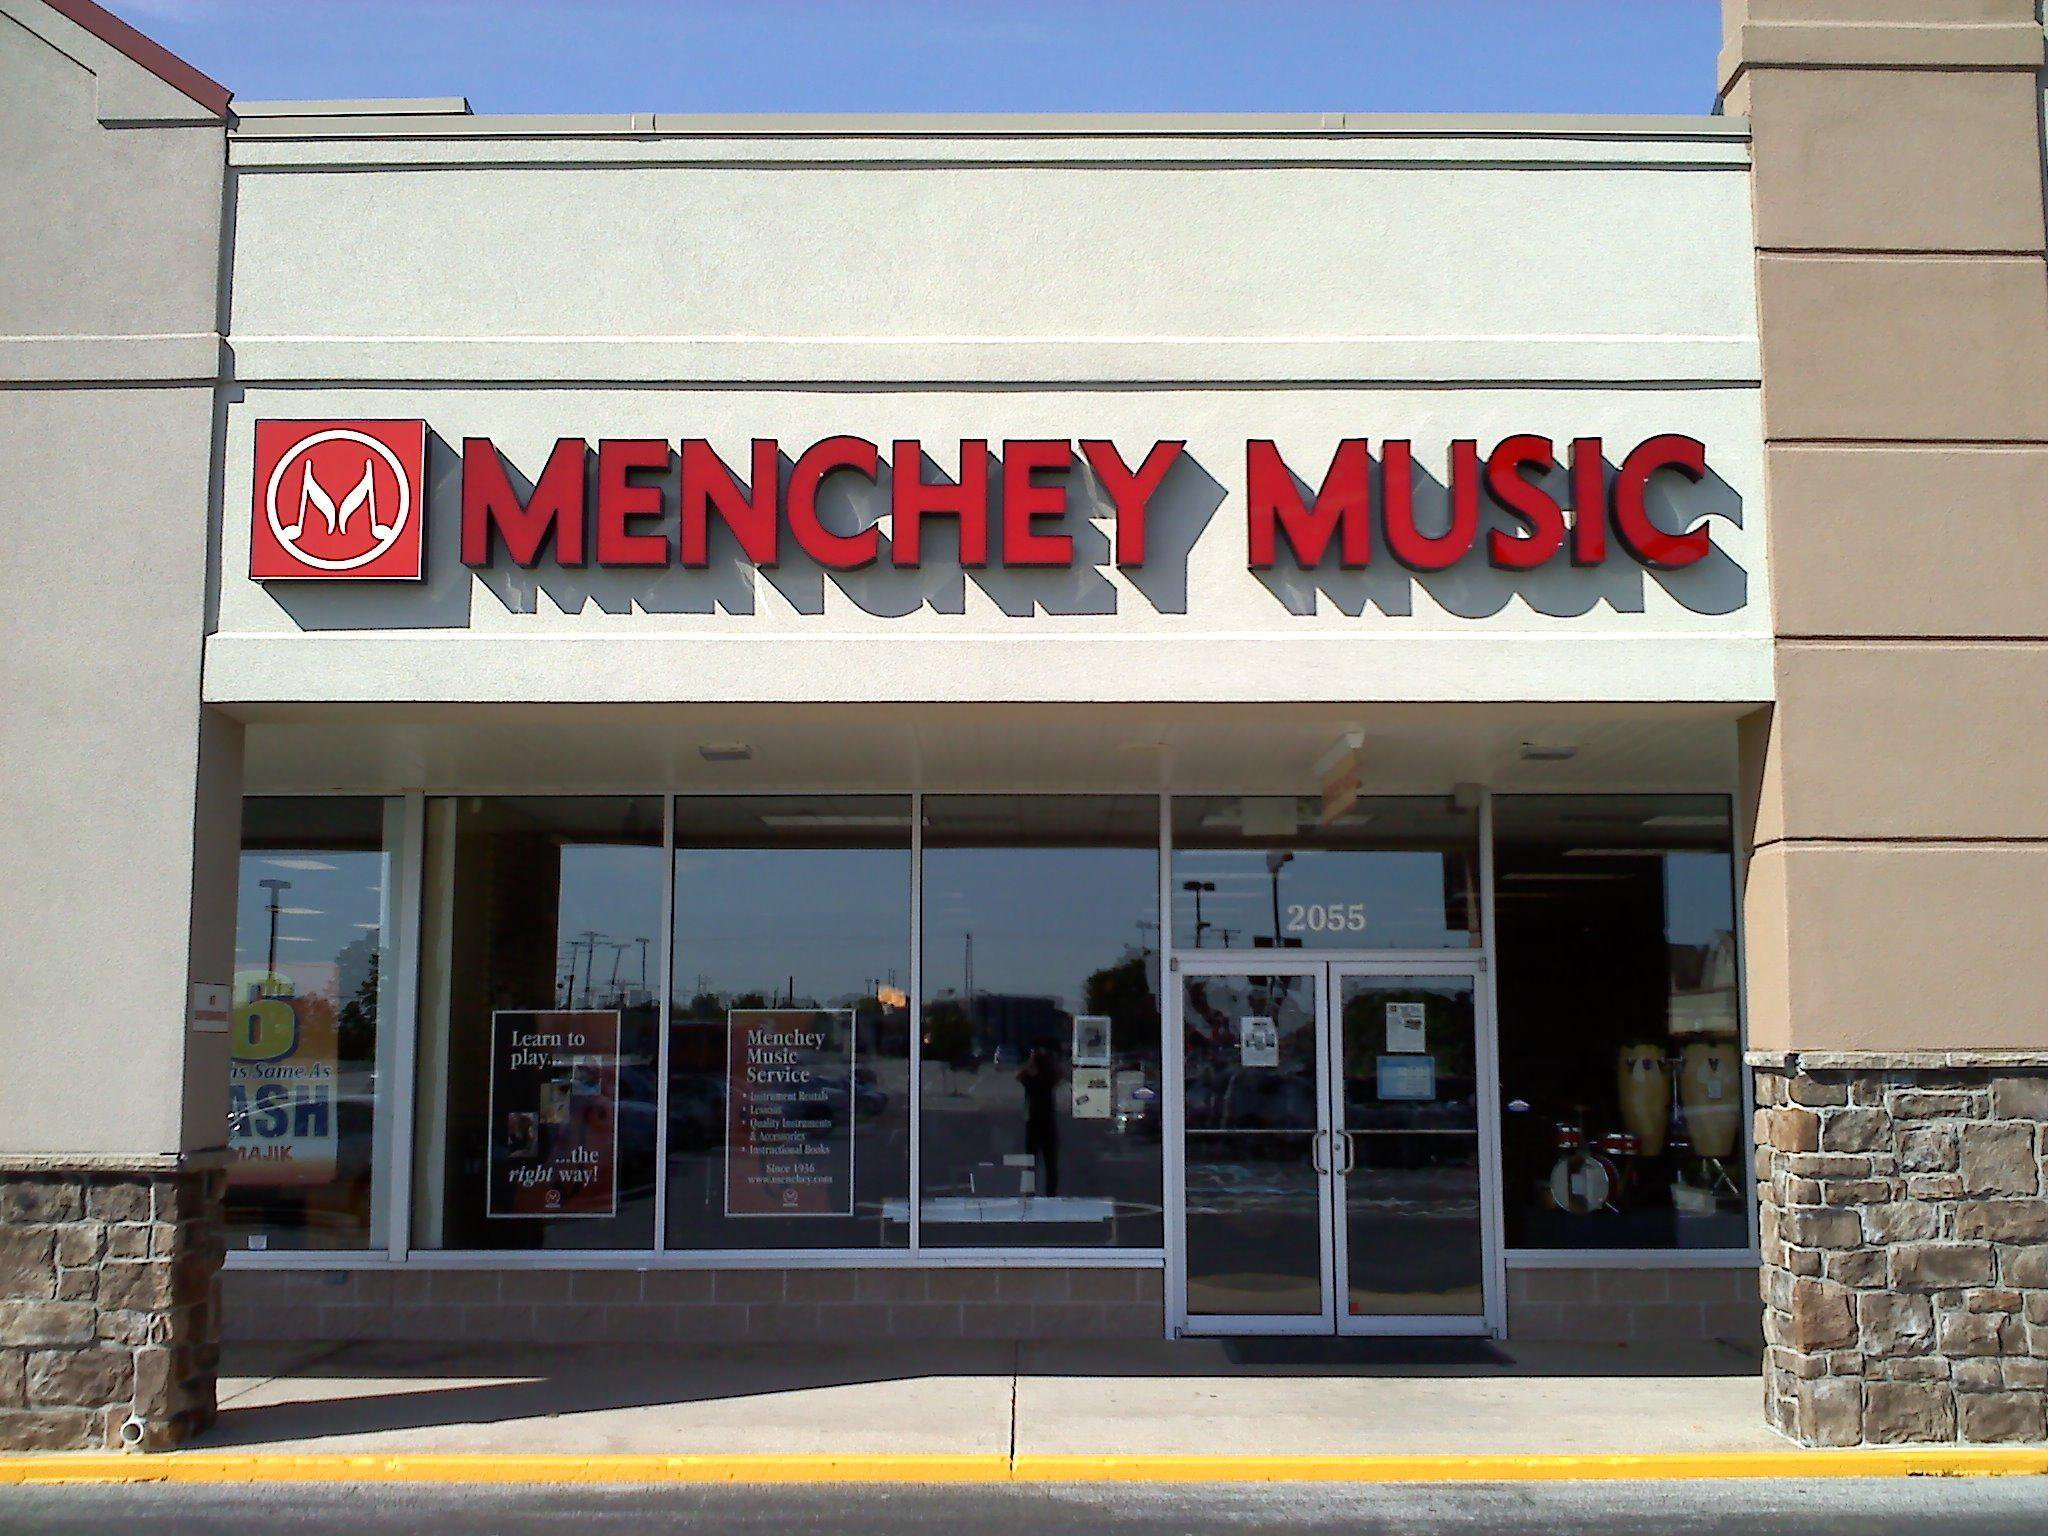 Menchey Music in York, PA